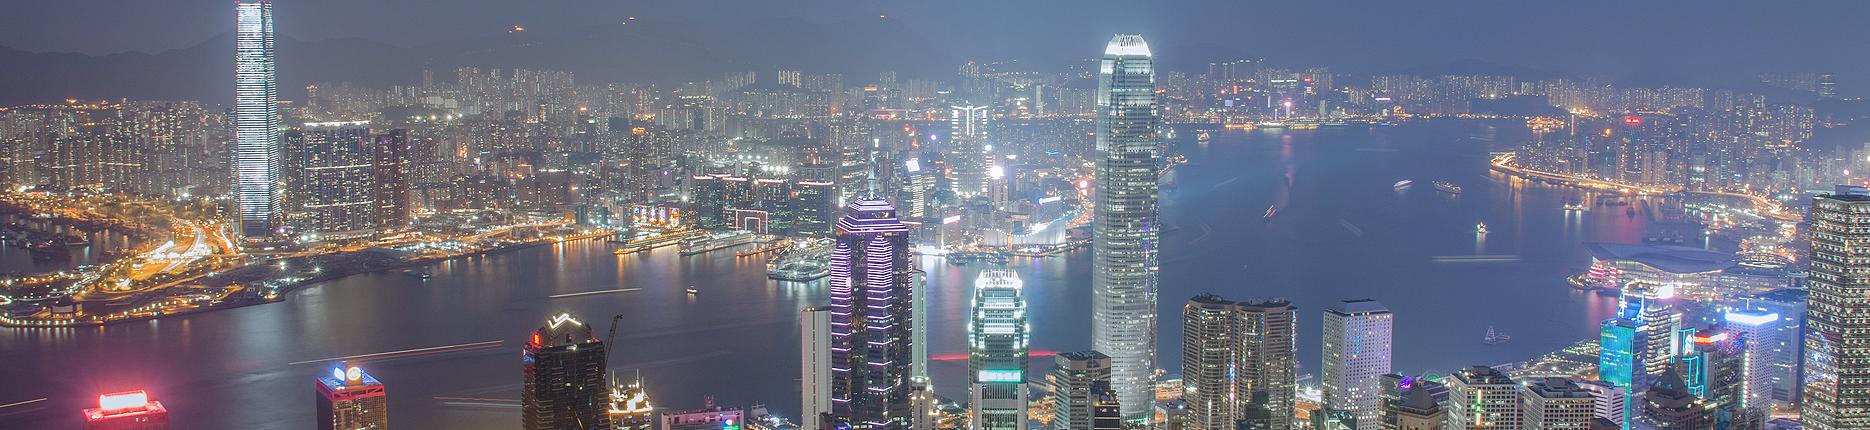 S-norton-web-banner-hongkong